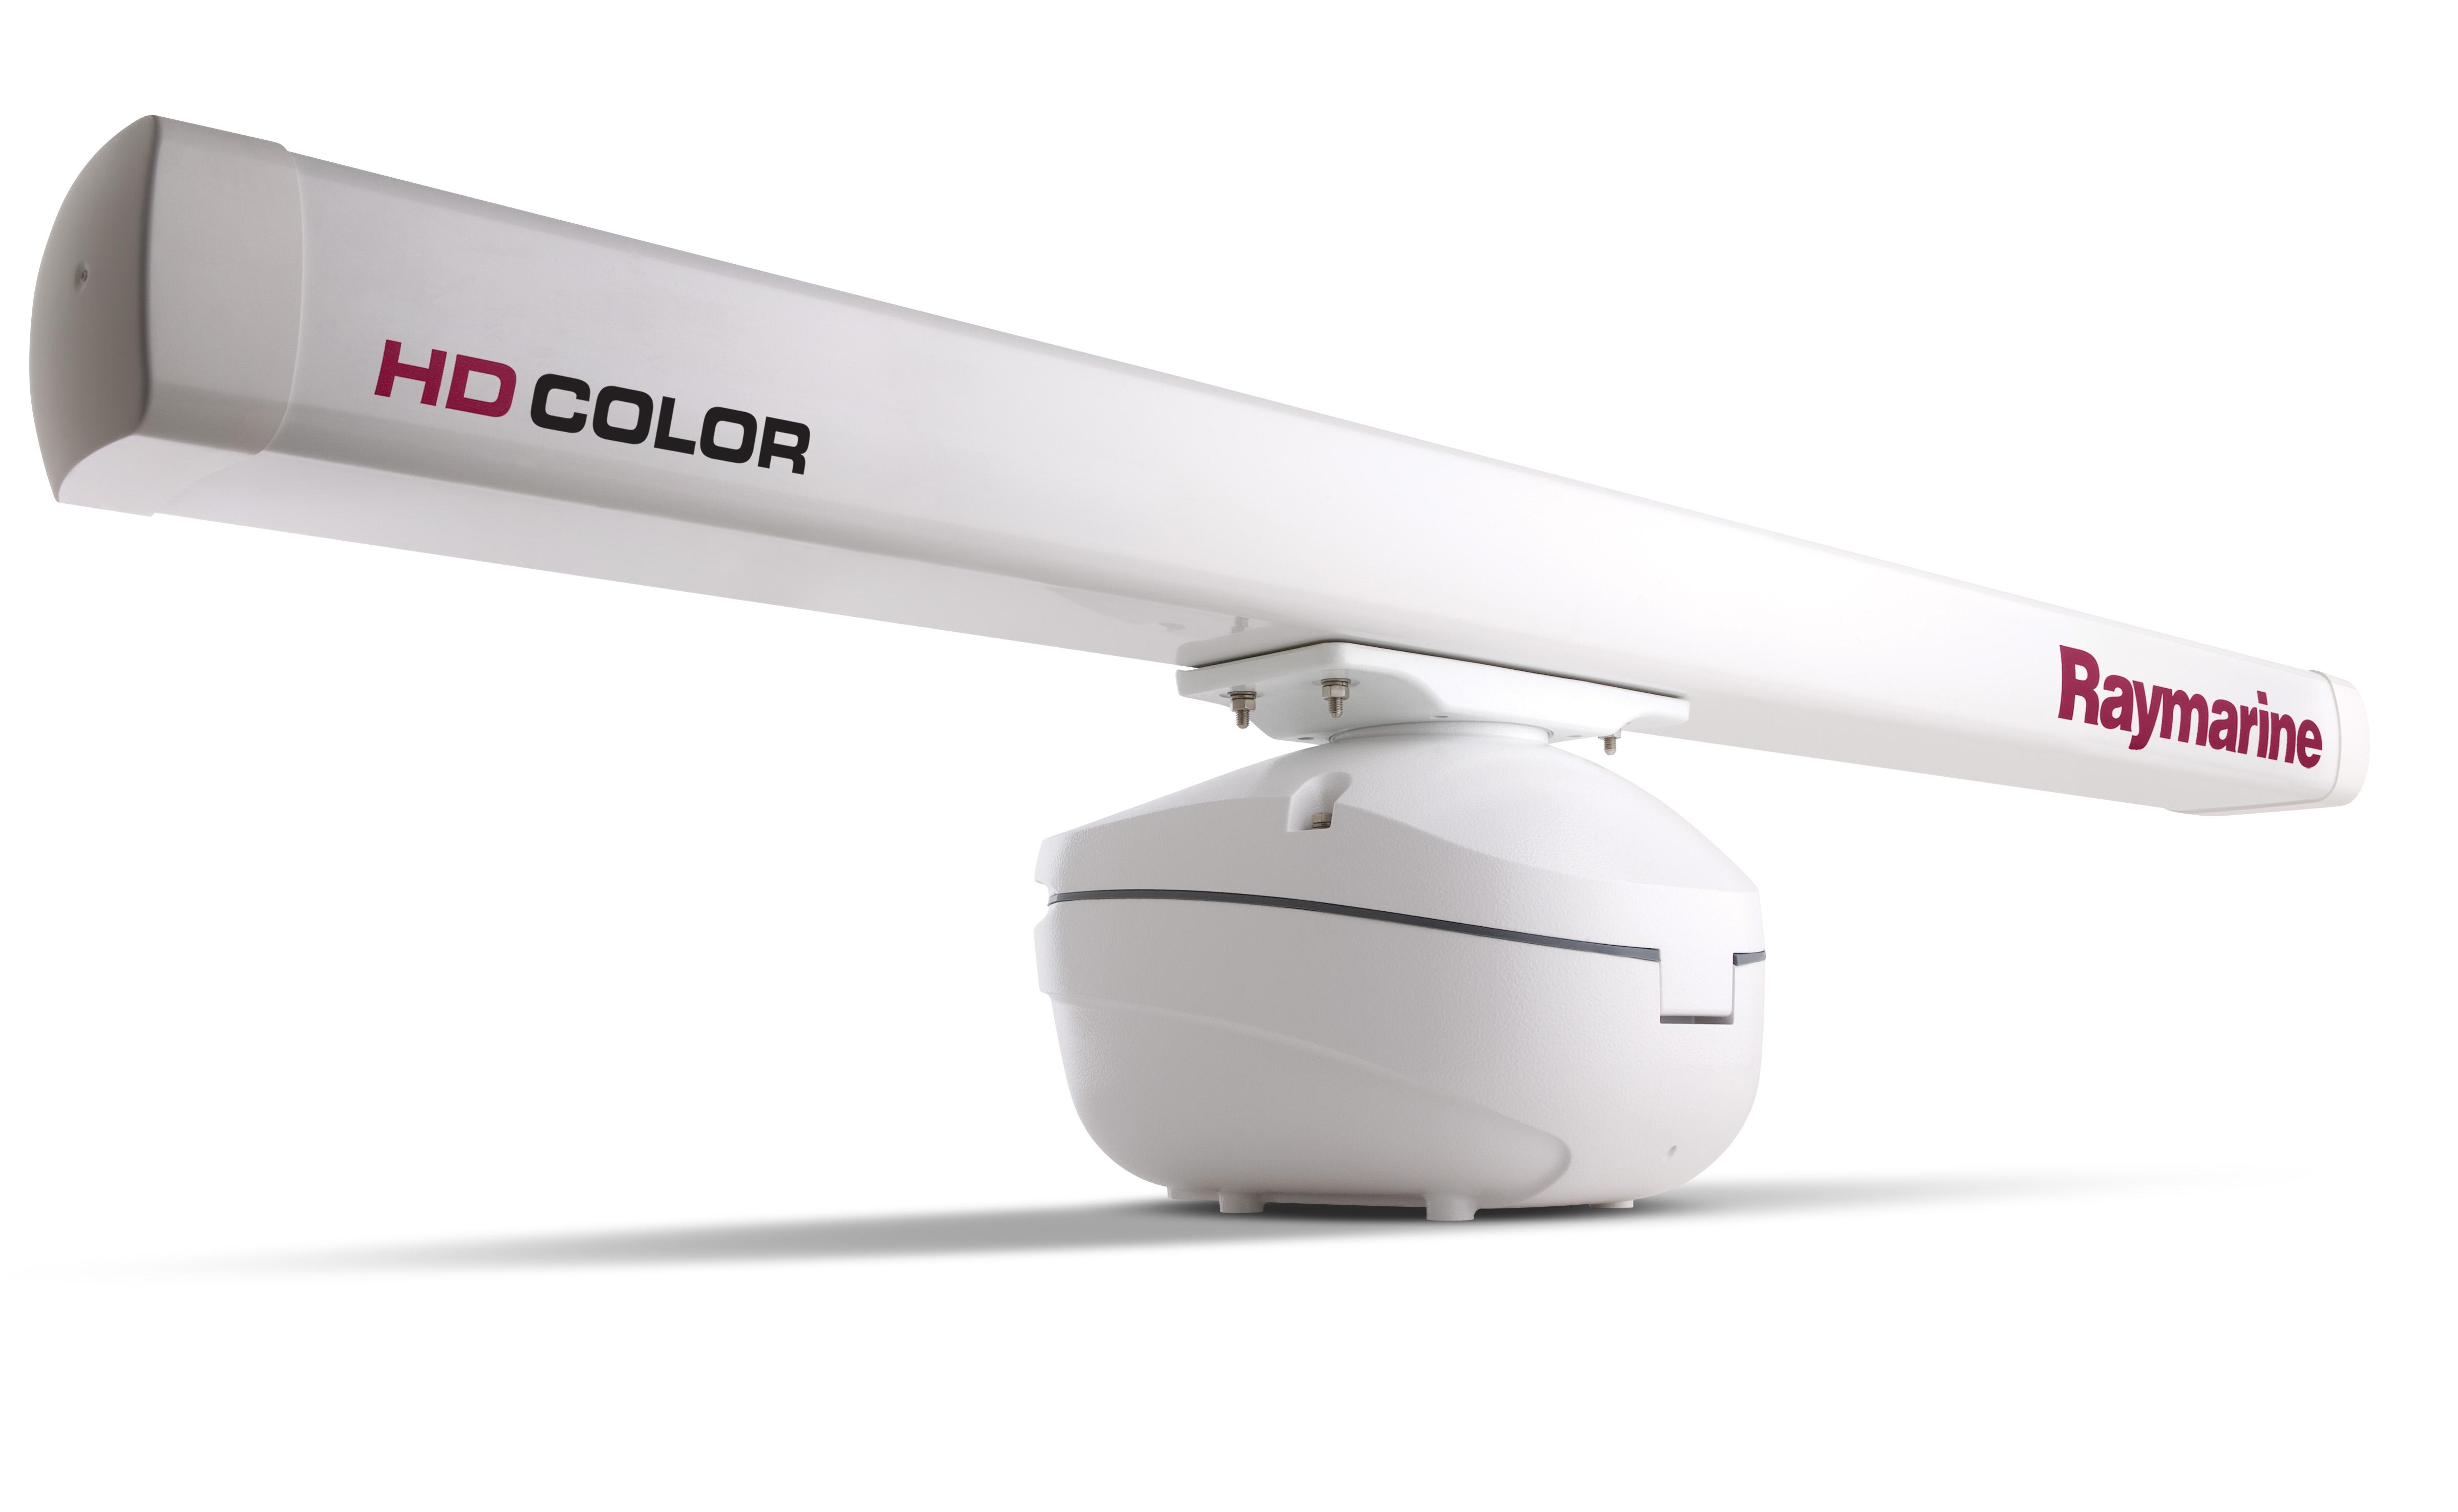 6ft super color open array angled radar